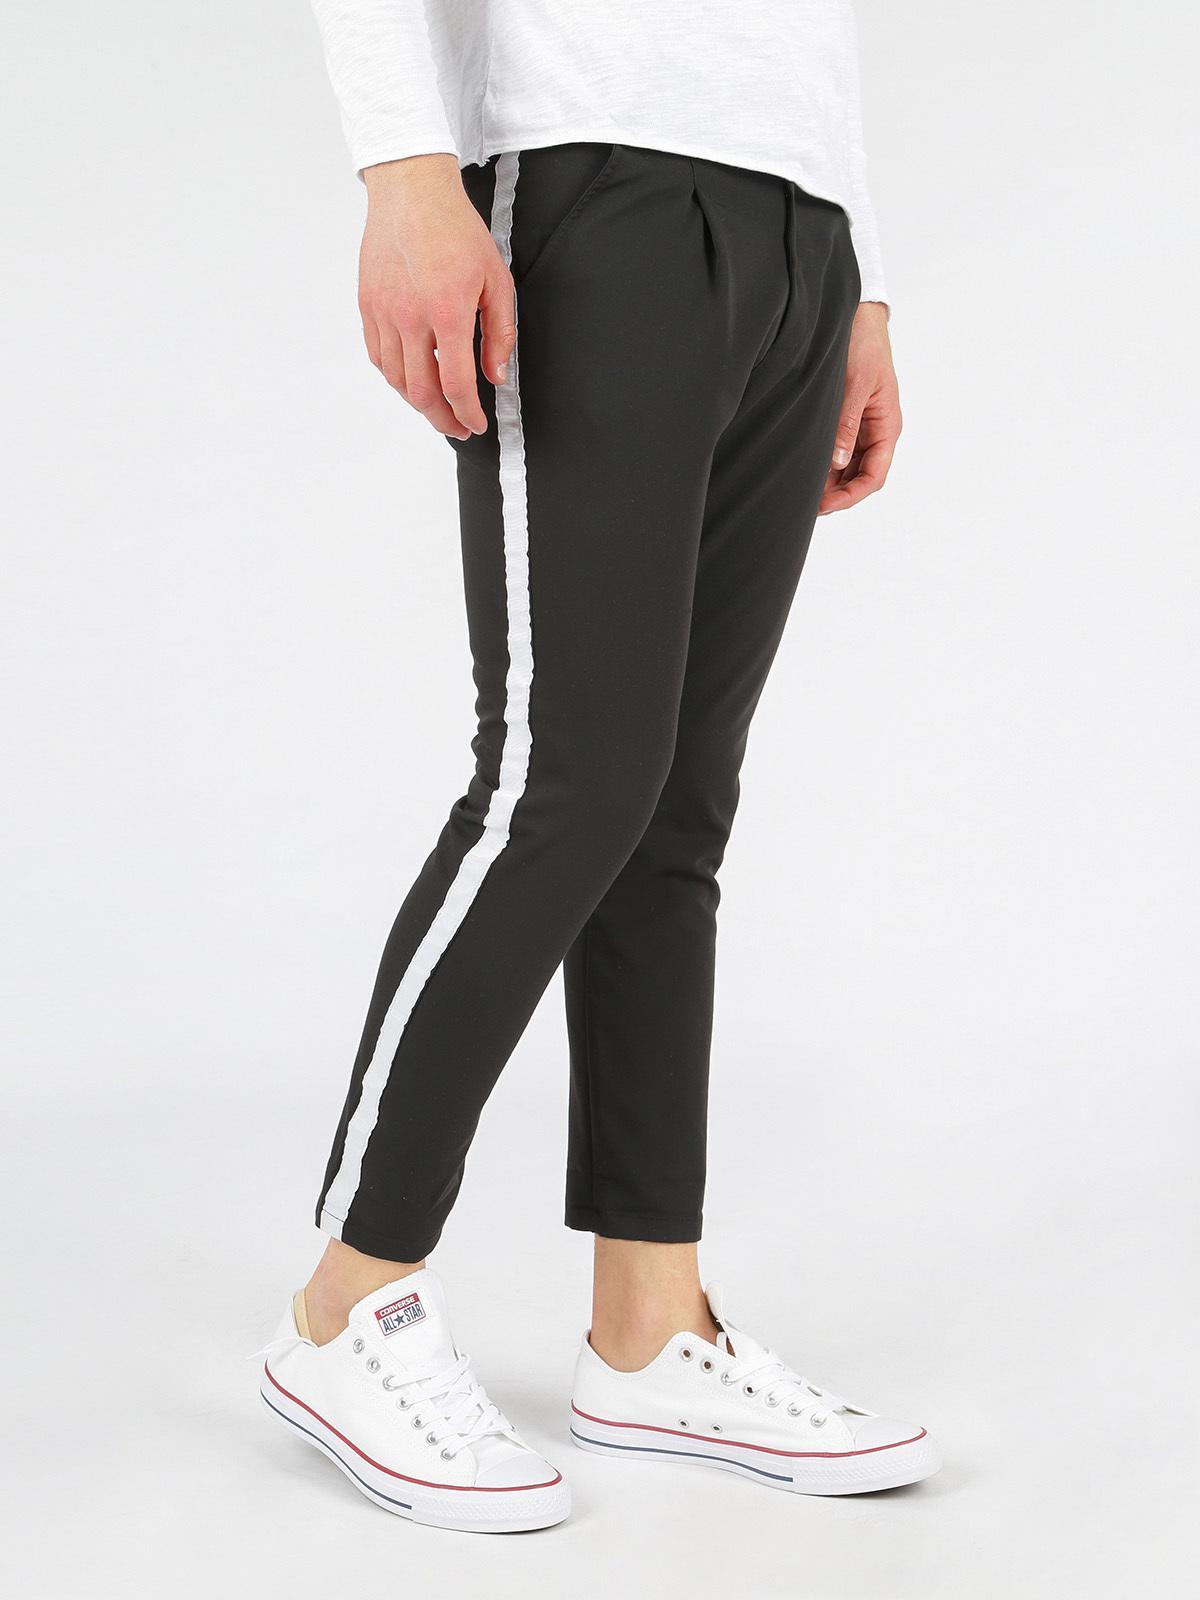 pantaloni nike con banda laterale